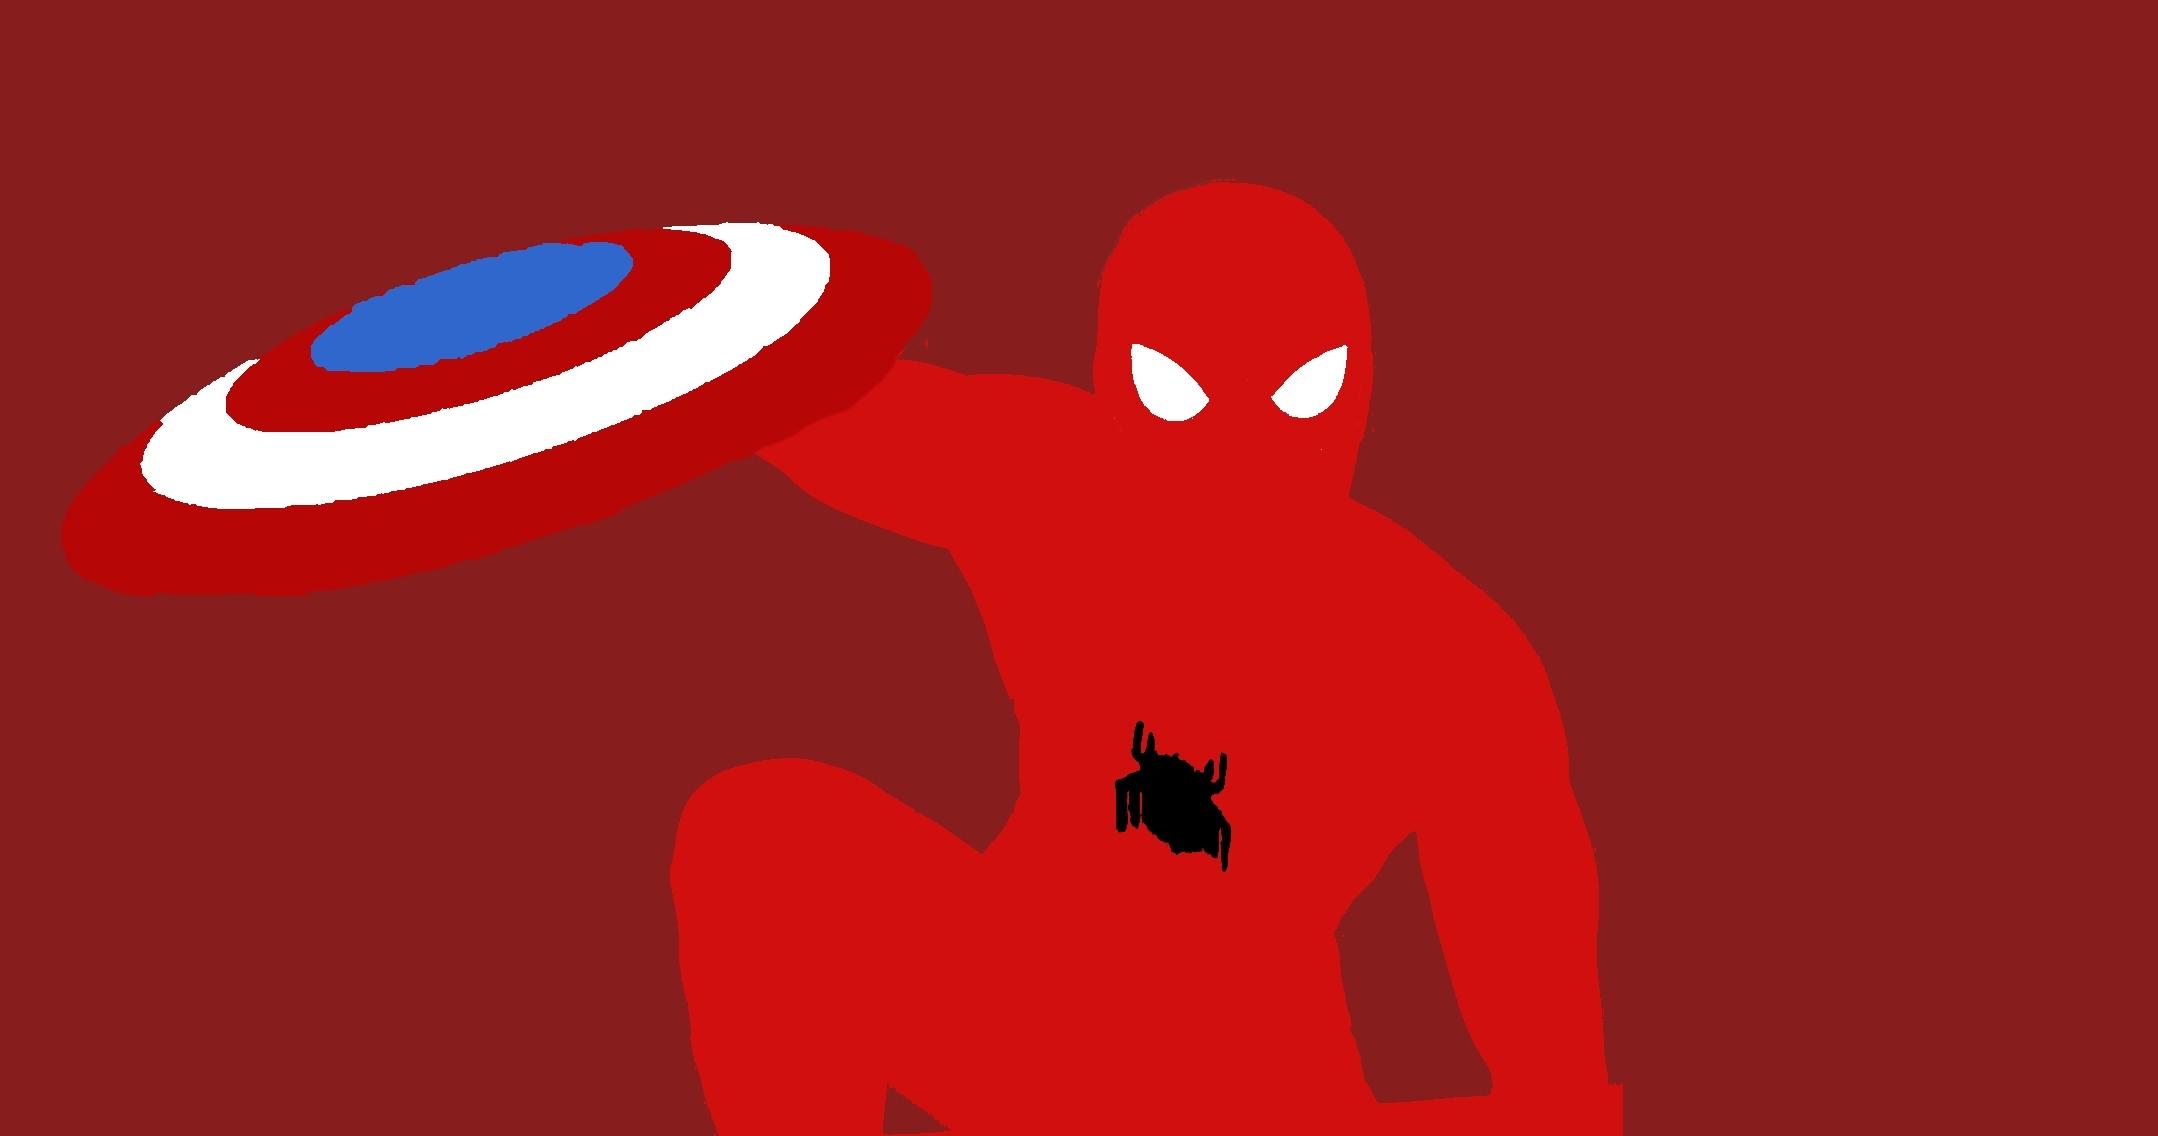 10 Top Spiderman Civil War Wallpaper Full Hd 1080p For Pc Background